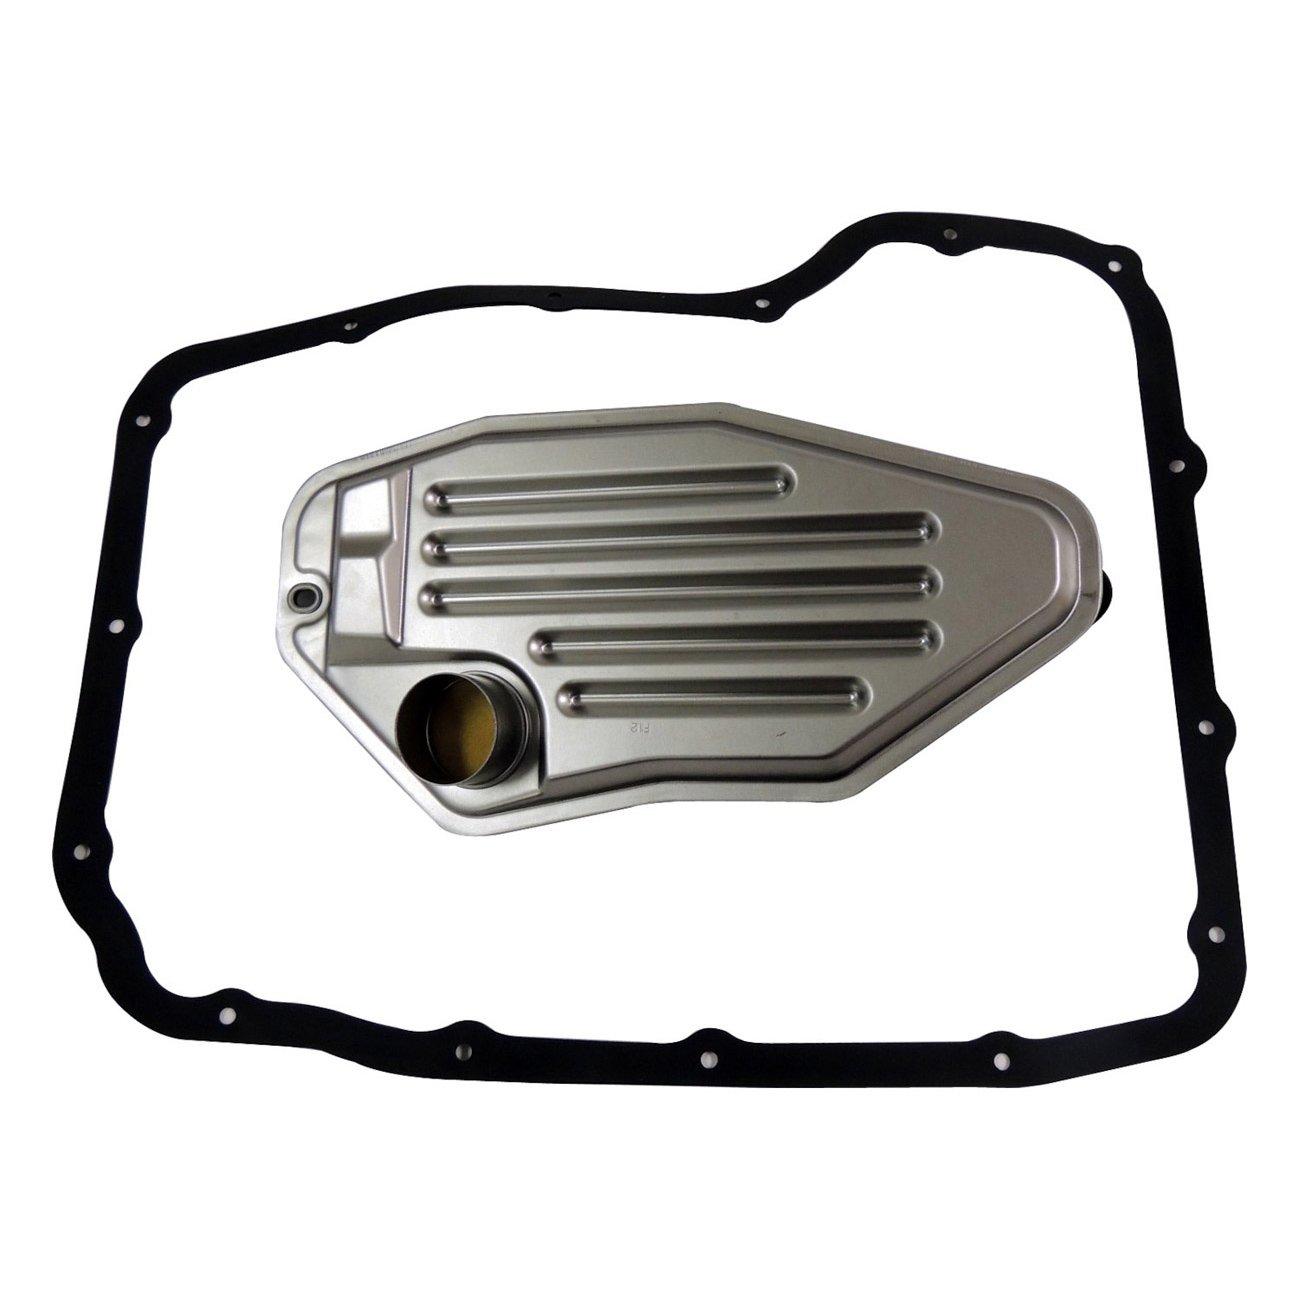 Kit filtro transmisió n automá tica 45RFE, 68RFE Crown Automotive